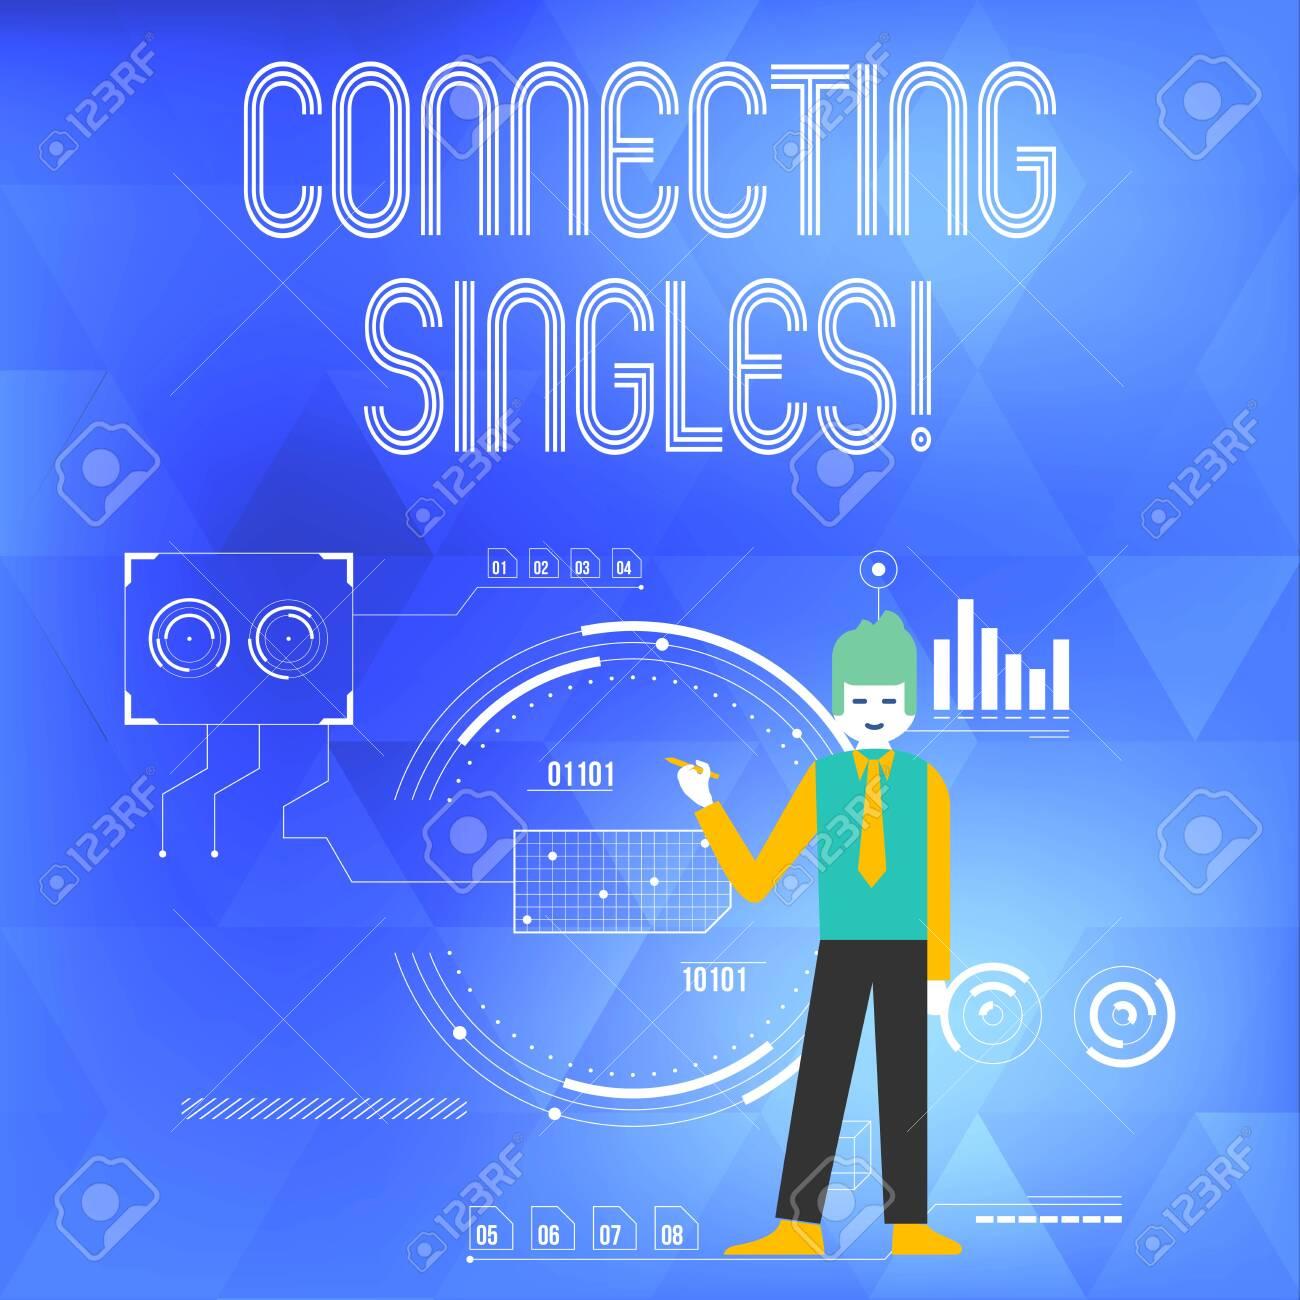 Online Dating process datortomografi intern eller extern